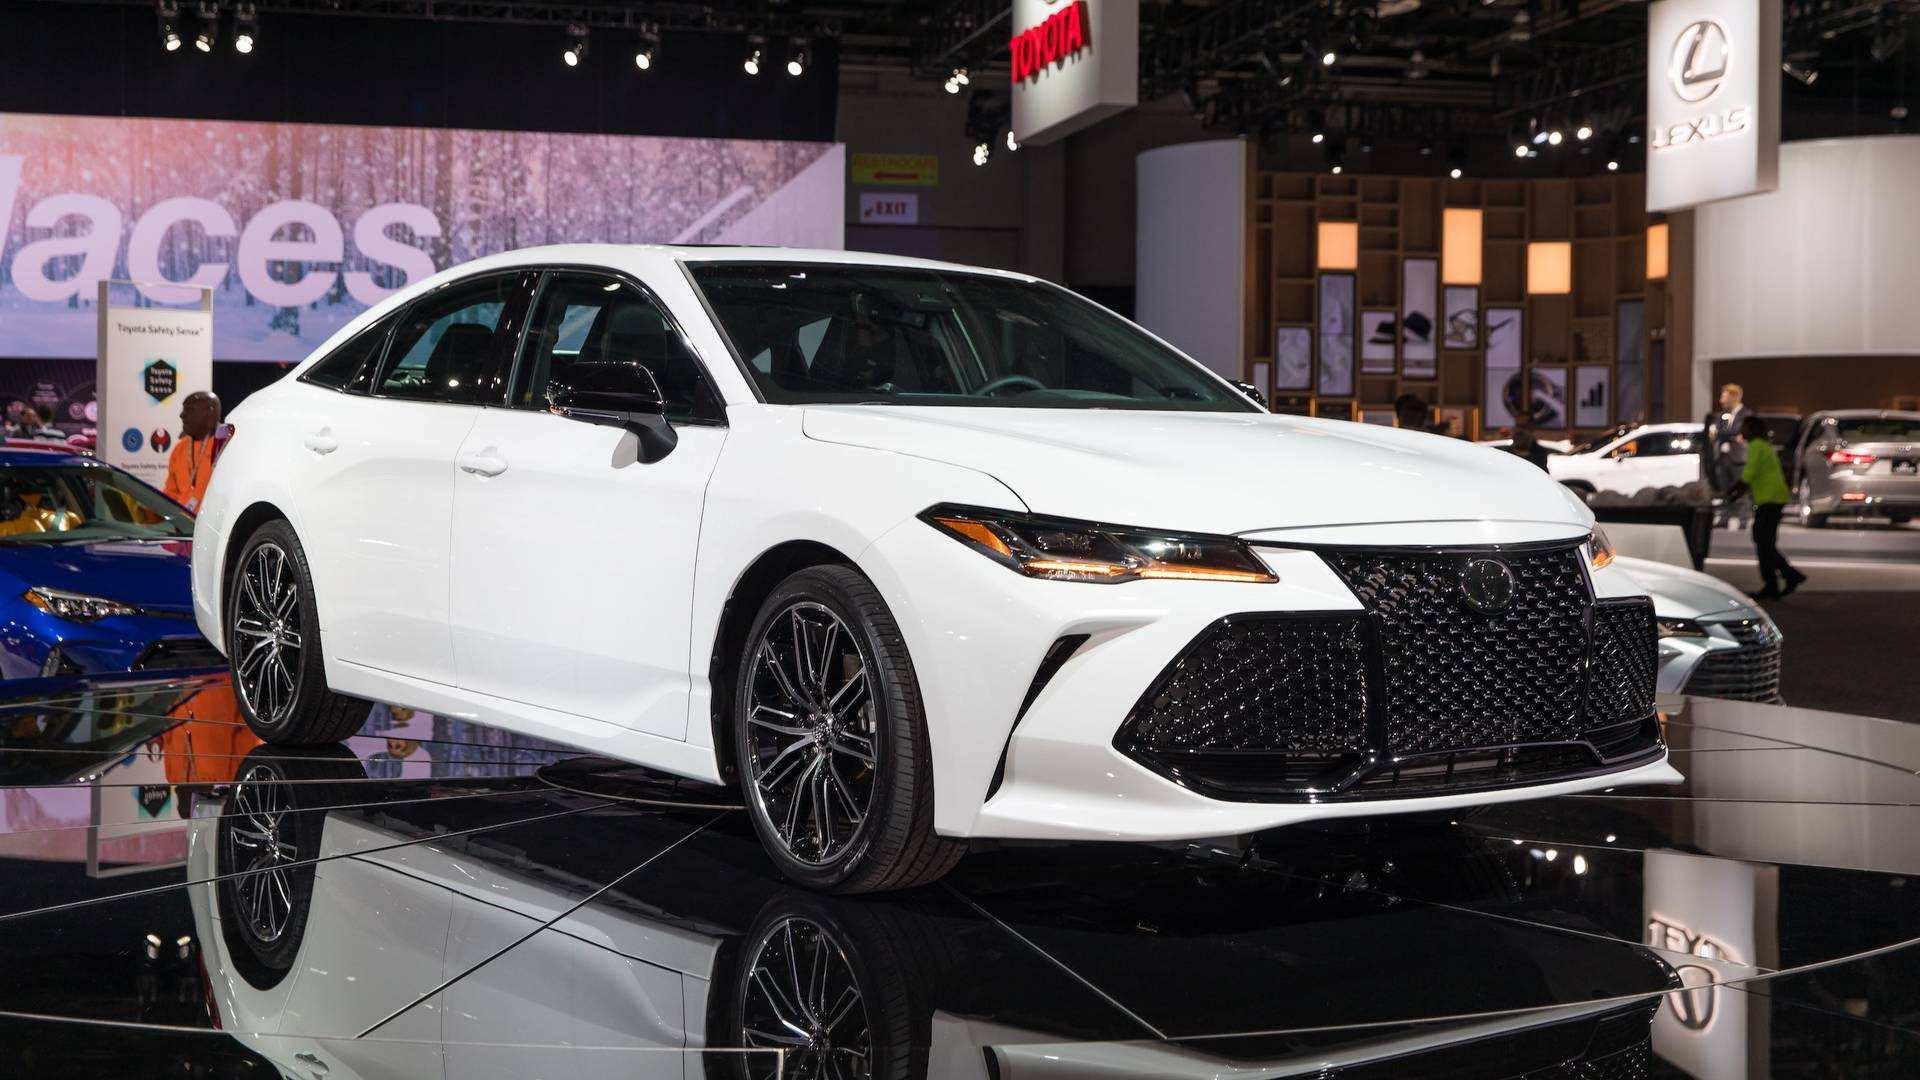 19 Best Review Best Avalon Toyota 2019 Interior Concept Price with Best Avalon Toyota 2019 Interior Concept